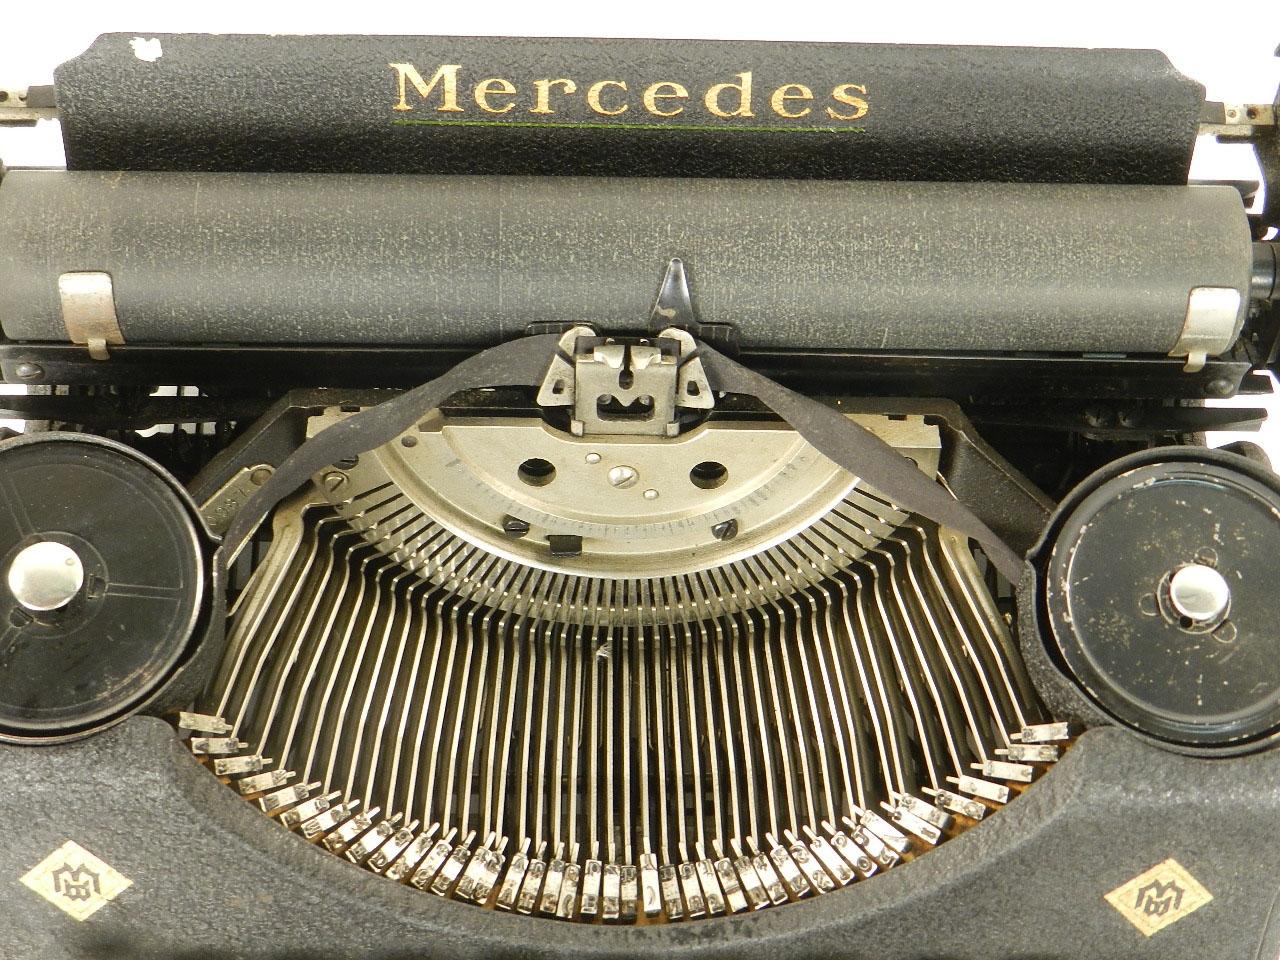 Imagen MERCEDES MODELL 33 AÑO 1930 26223